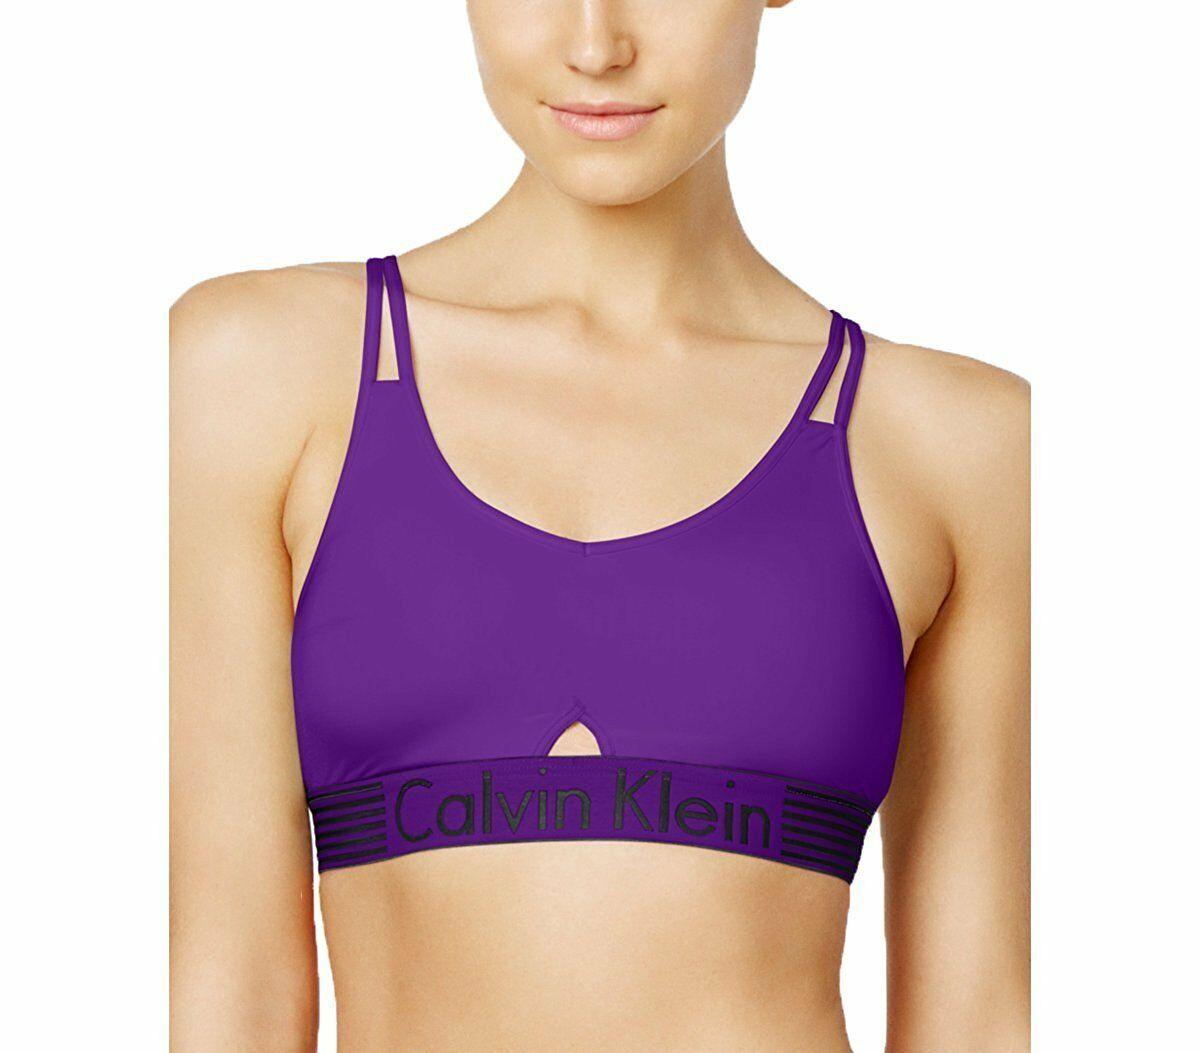 Calvin Klein Iron Strength Low Impact Logo Sports Bralette Purple QF1537-501 NWT